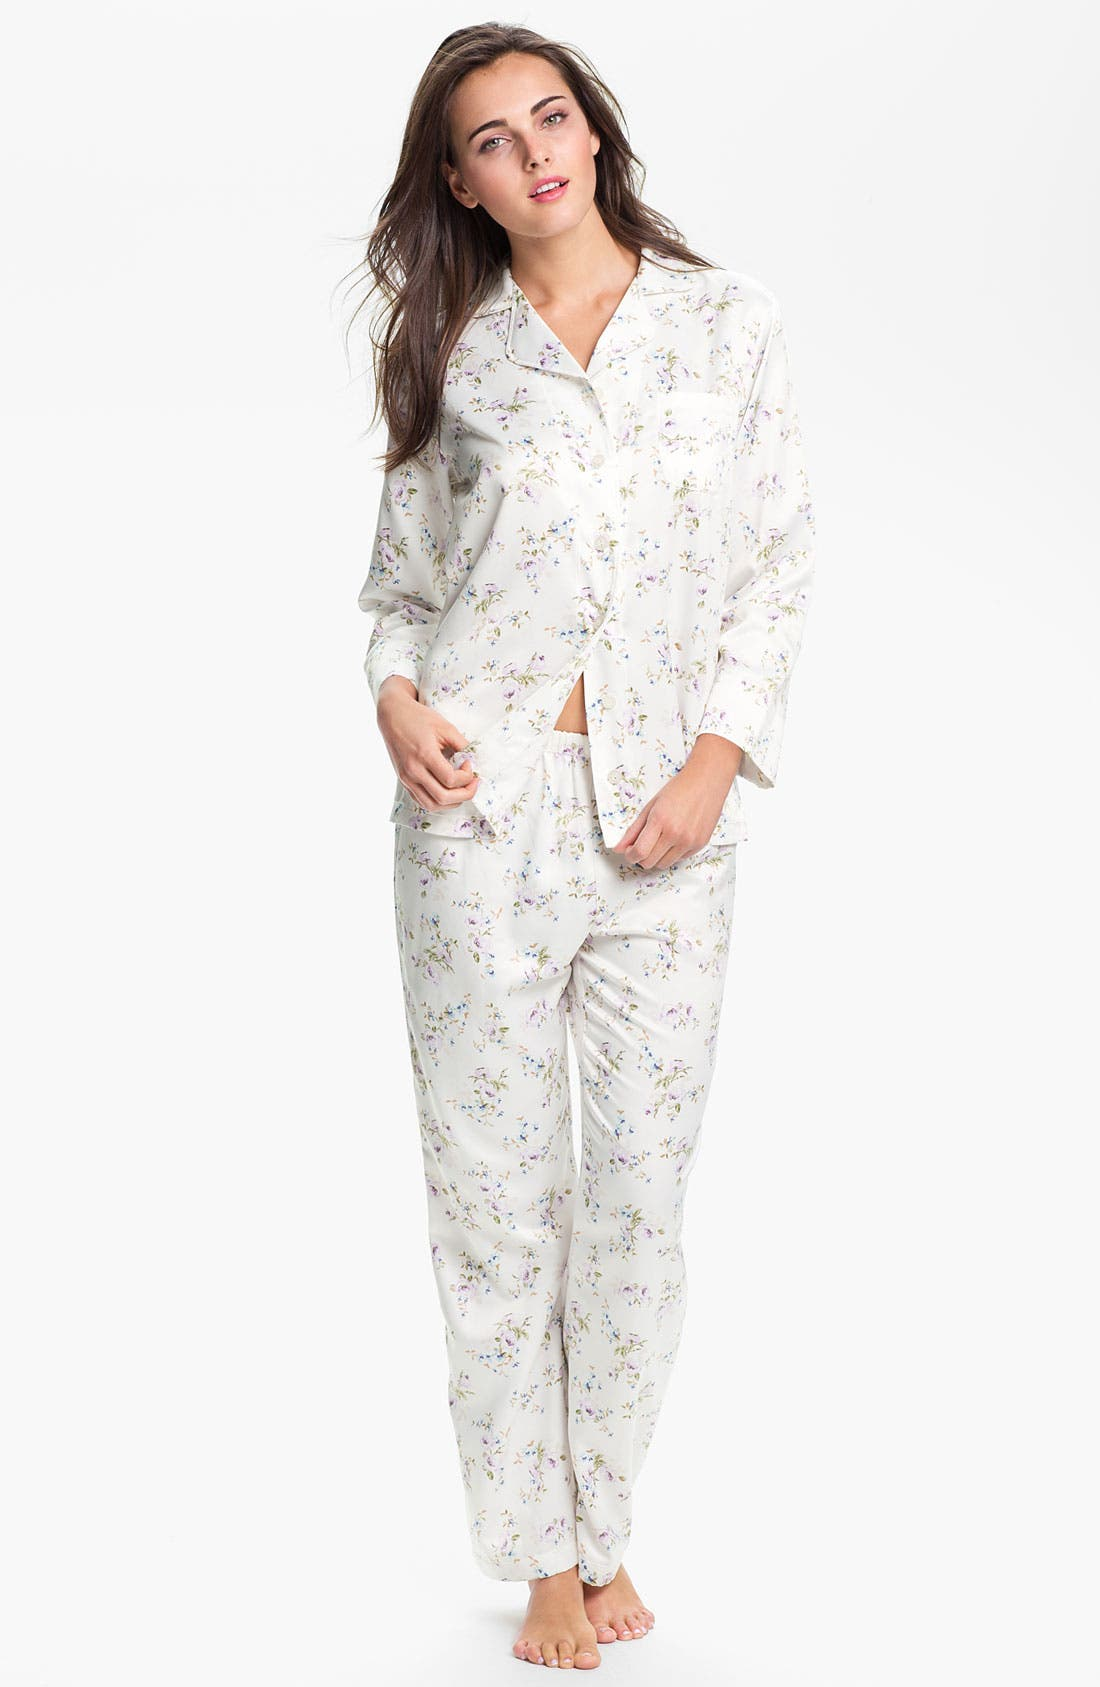 Alternate Image 1 Selected - Carole Hochman 'Cozy Back Satin' Pajamas